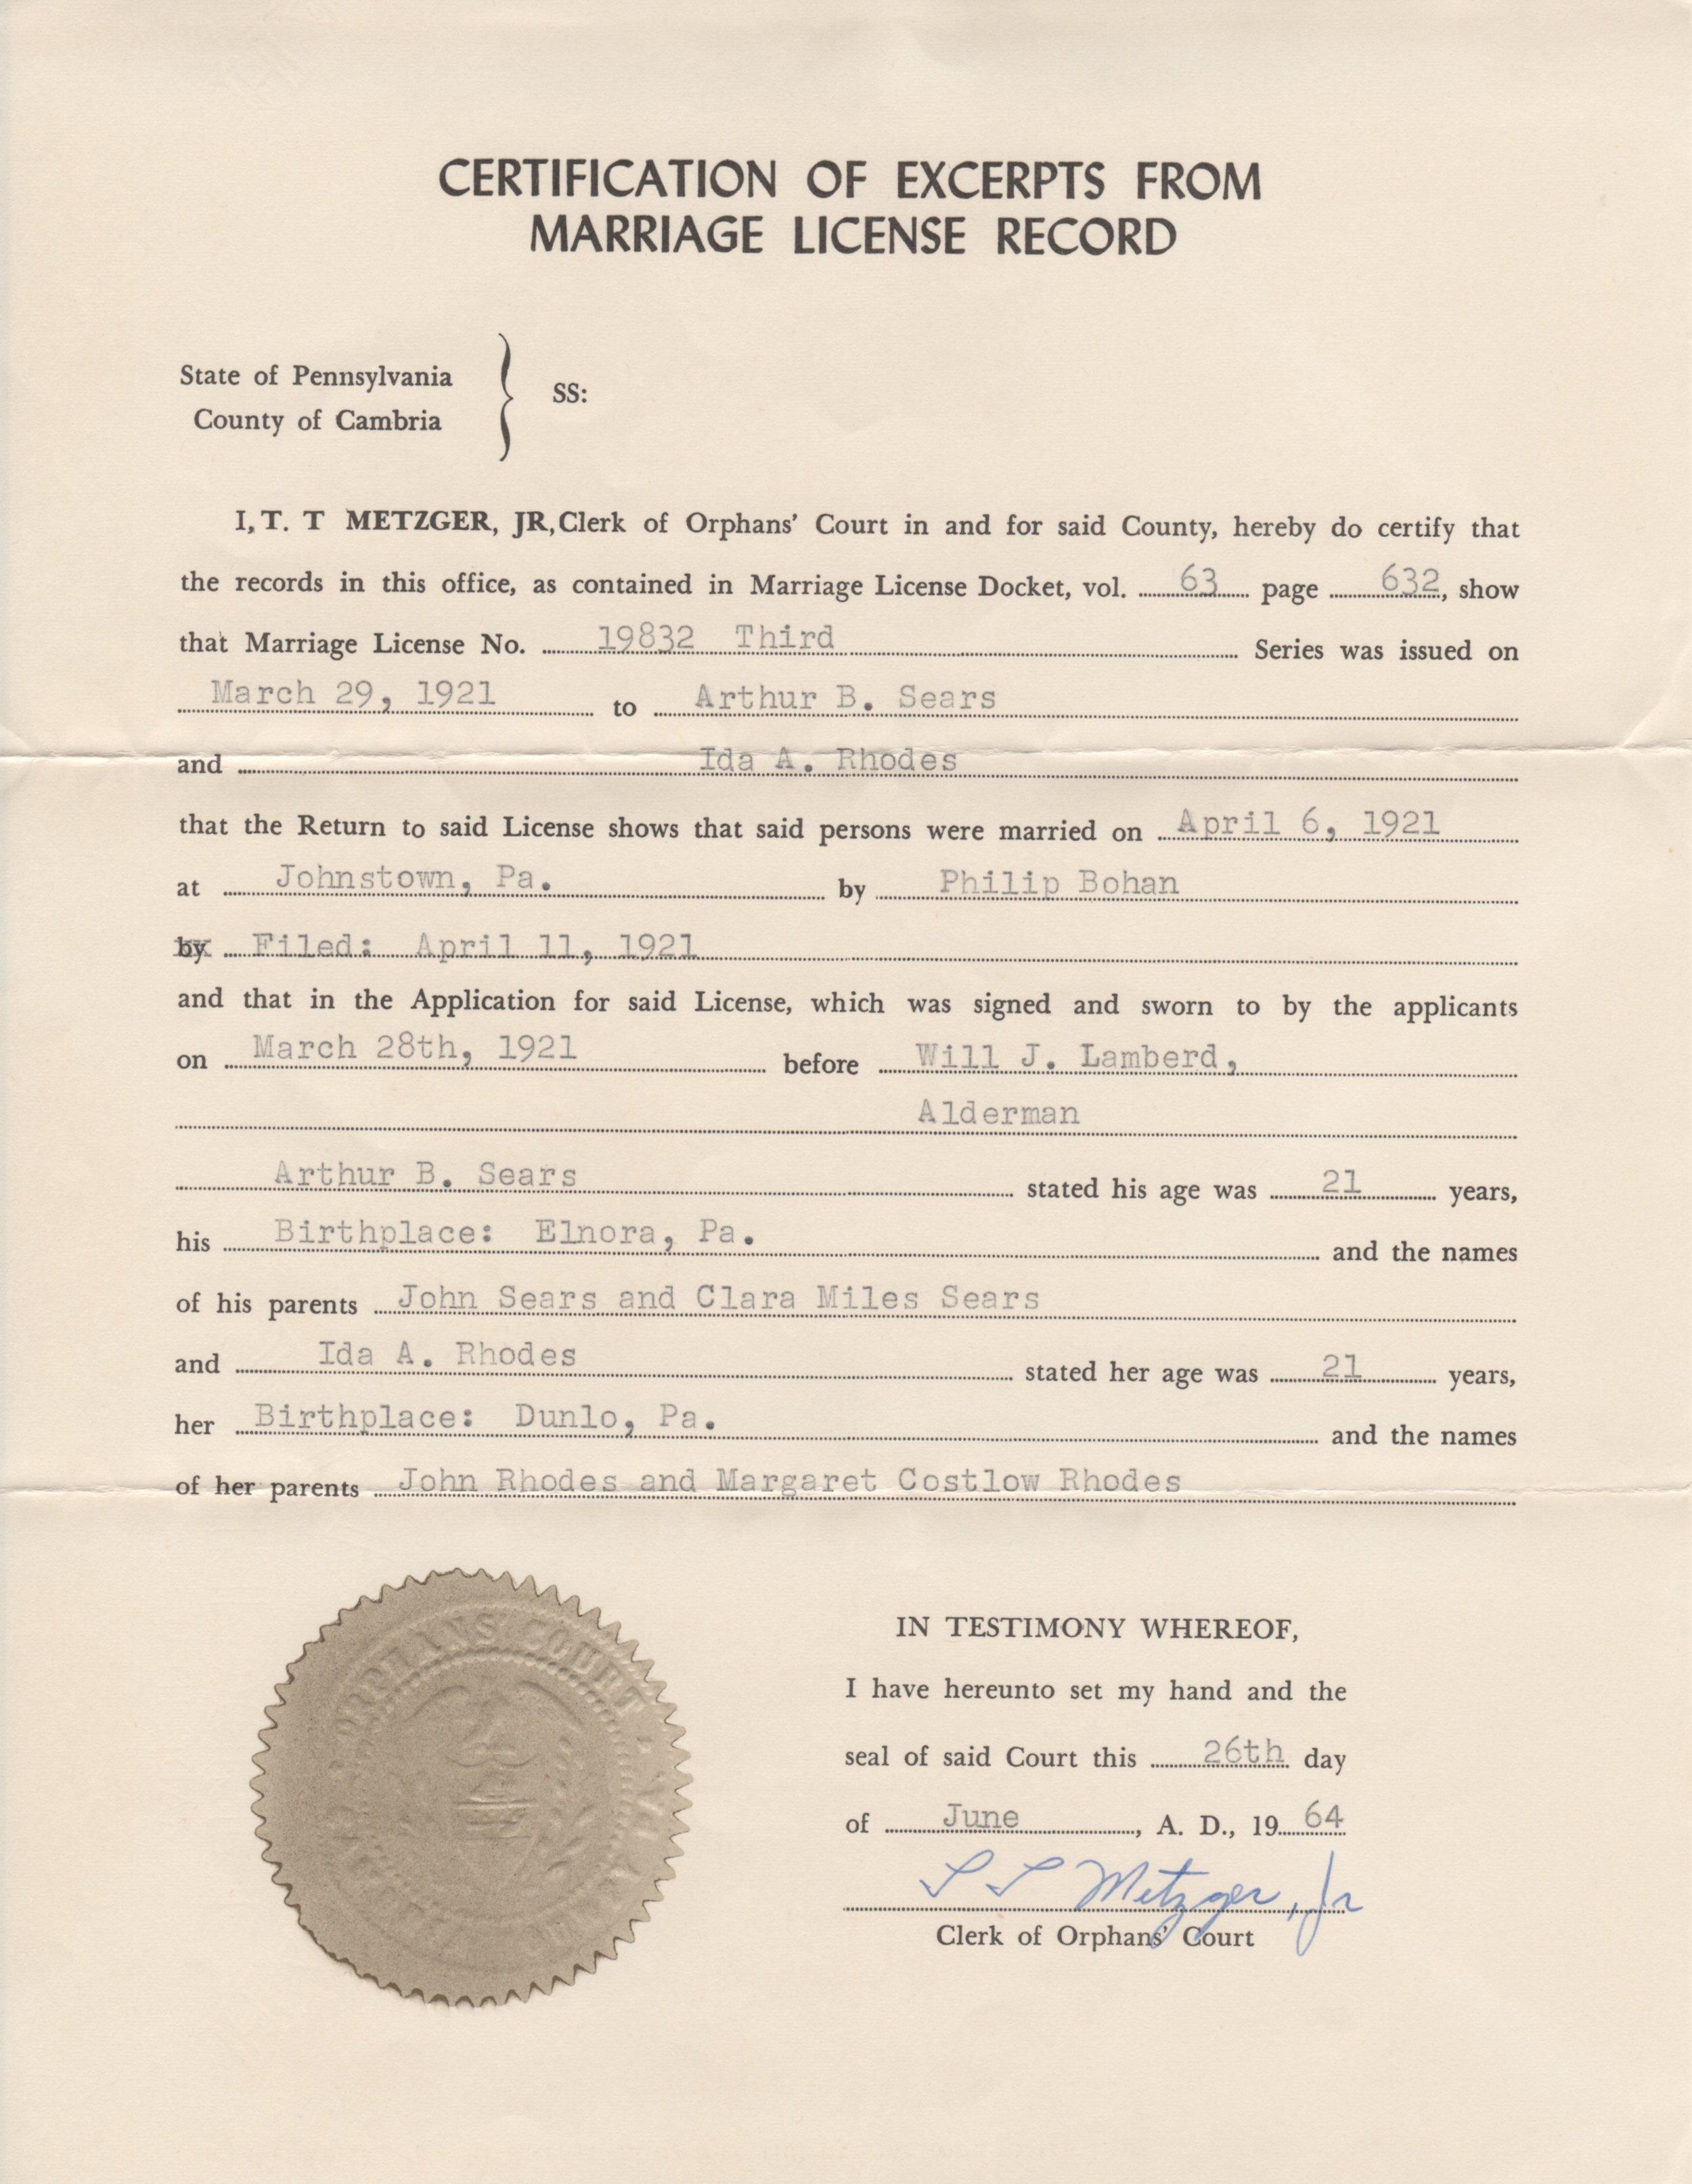 Marriage License Record of Arthur B. Sears and Ida Rhoads Sears